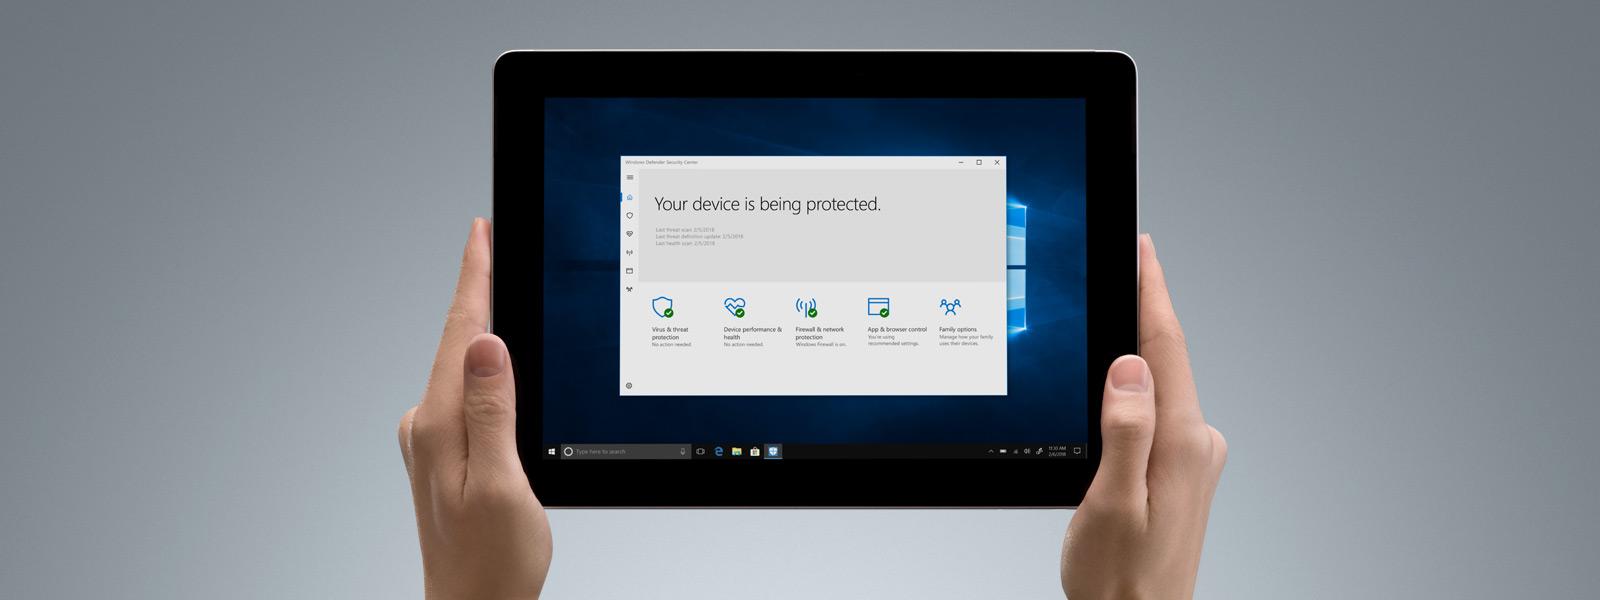 像平板電腦般拿著 Surface Go 與 Windows Defender